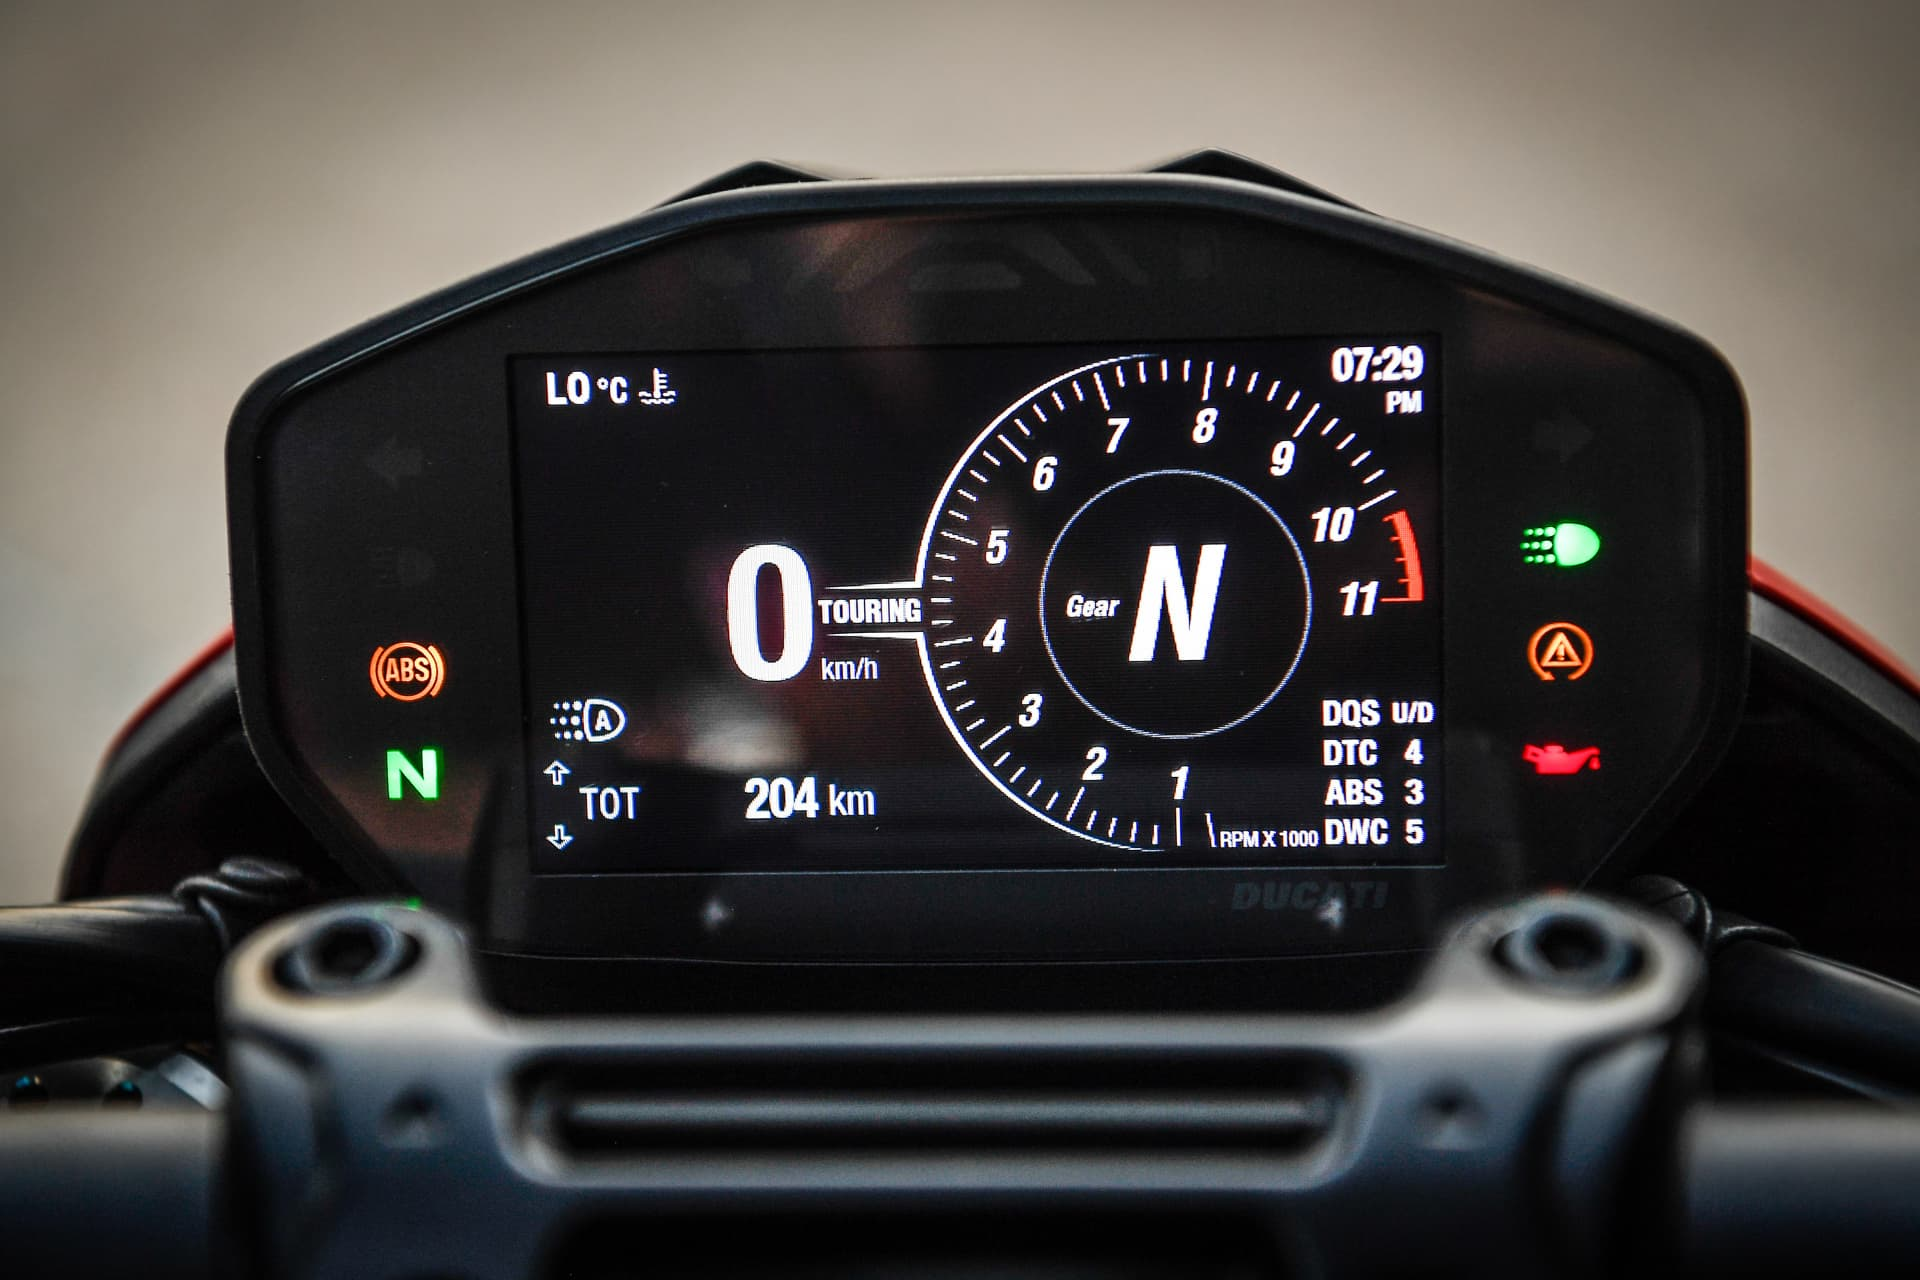 Ducati Hypermotard 950 Sp Static 20 Uc70321 Mid